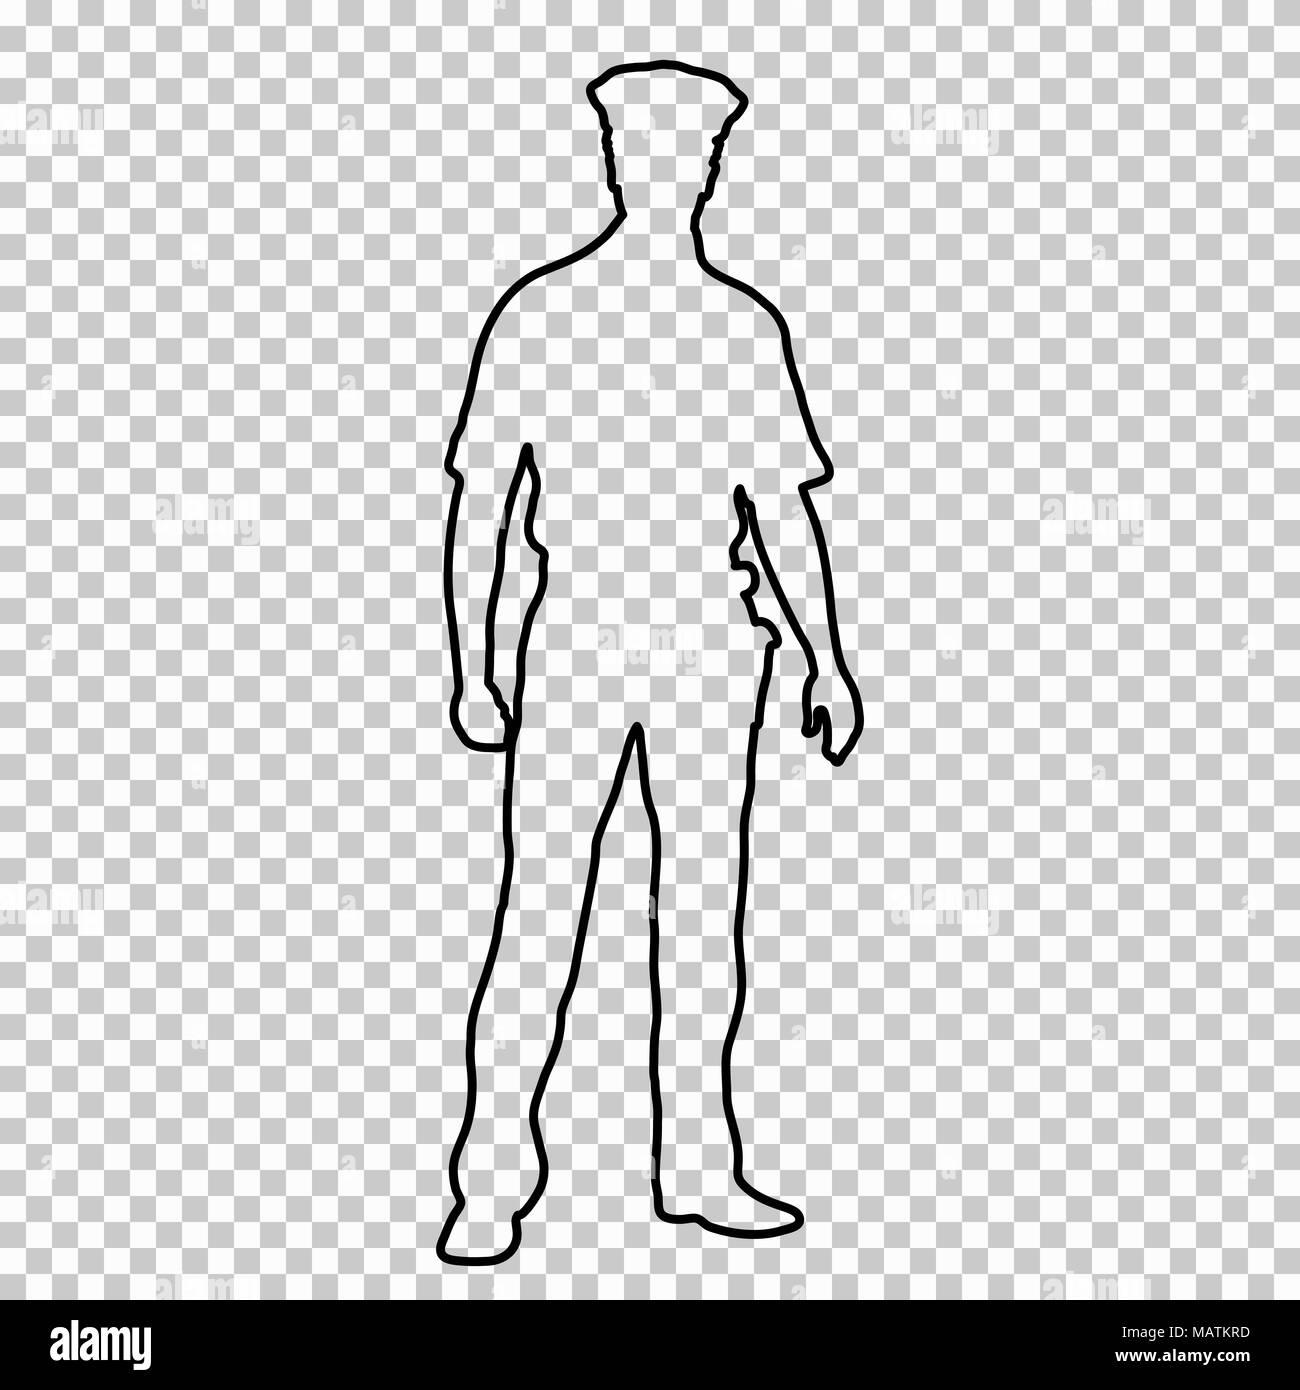 outline figure police man standing front side contour portrait male